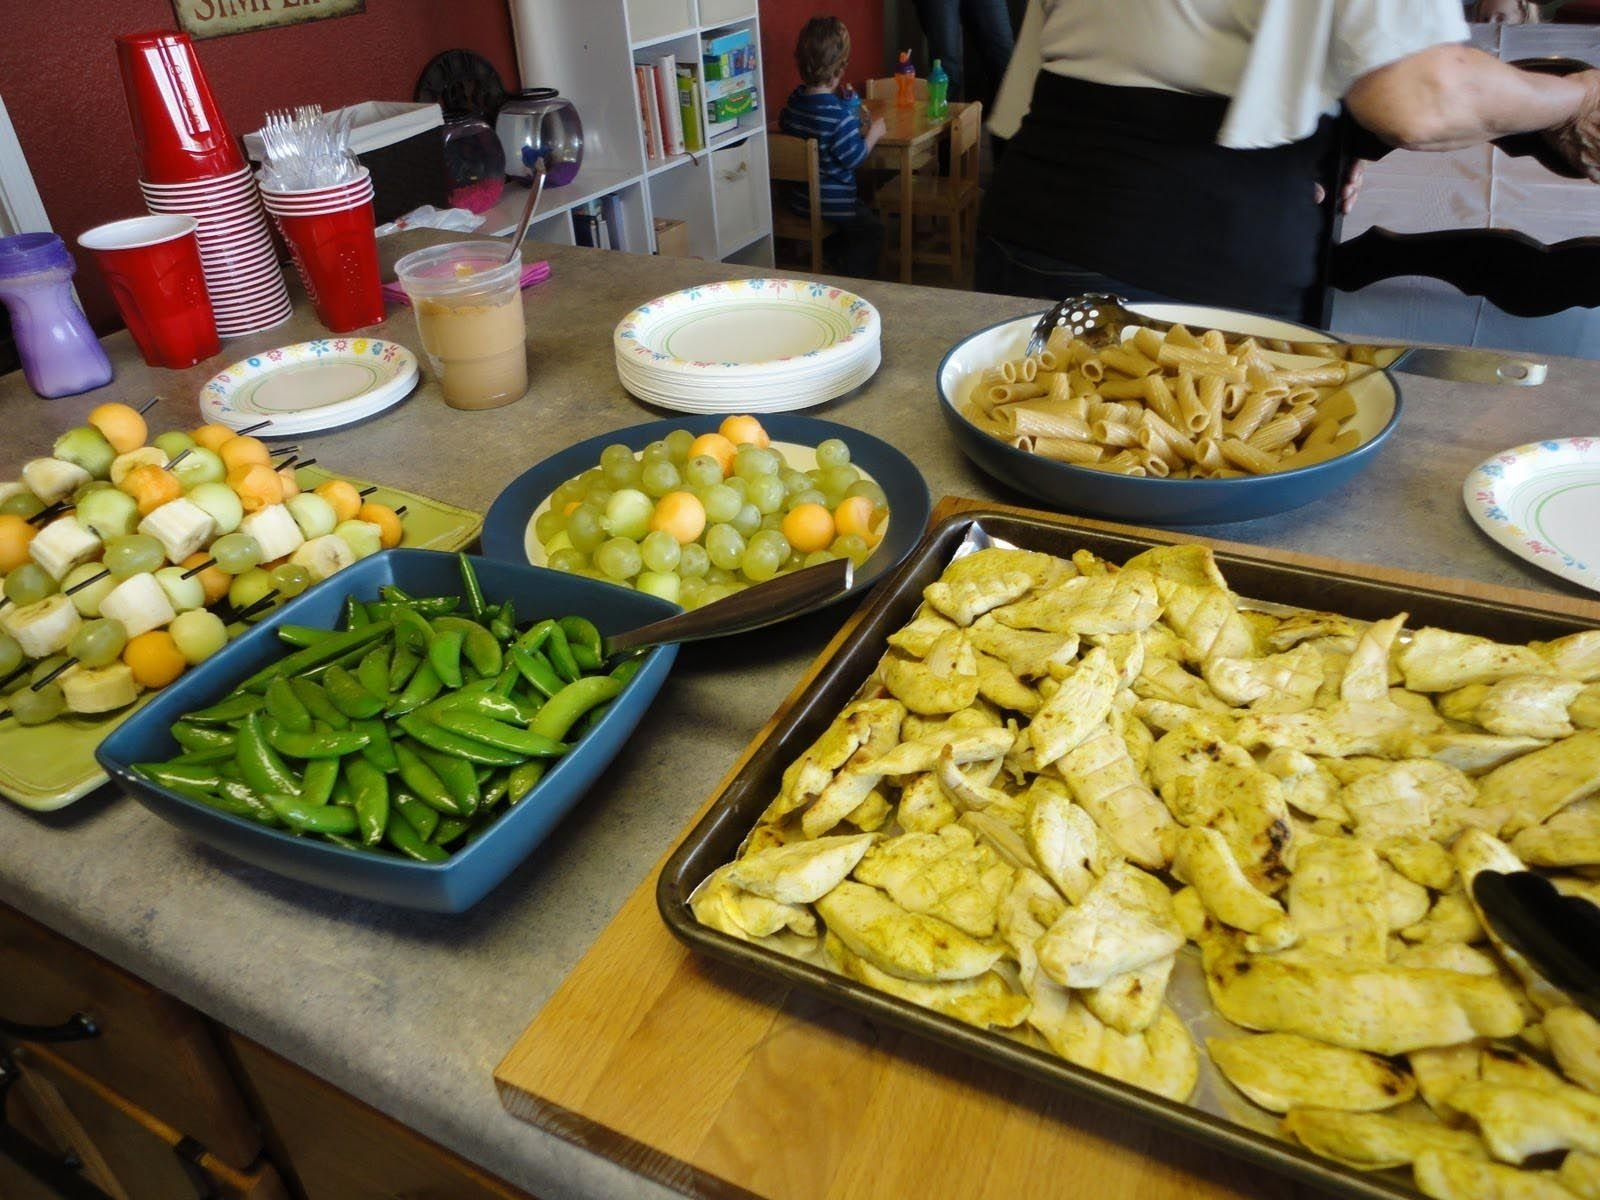 10 Most Popular Finger Food Ideas For Kids Birthday Party food for toddler birthday party birthday party pinterest 1 2021